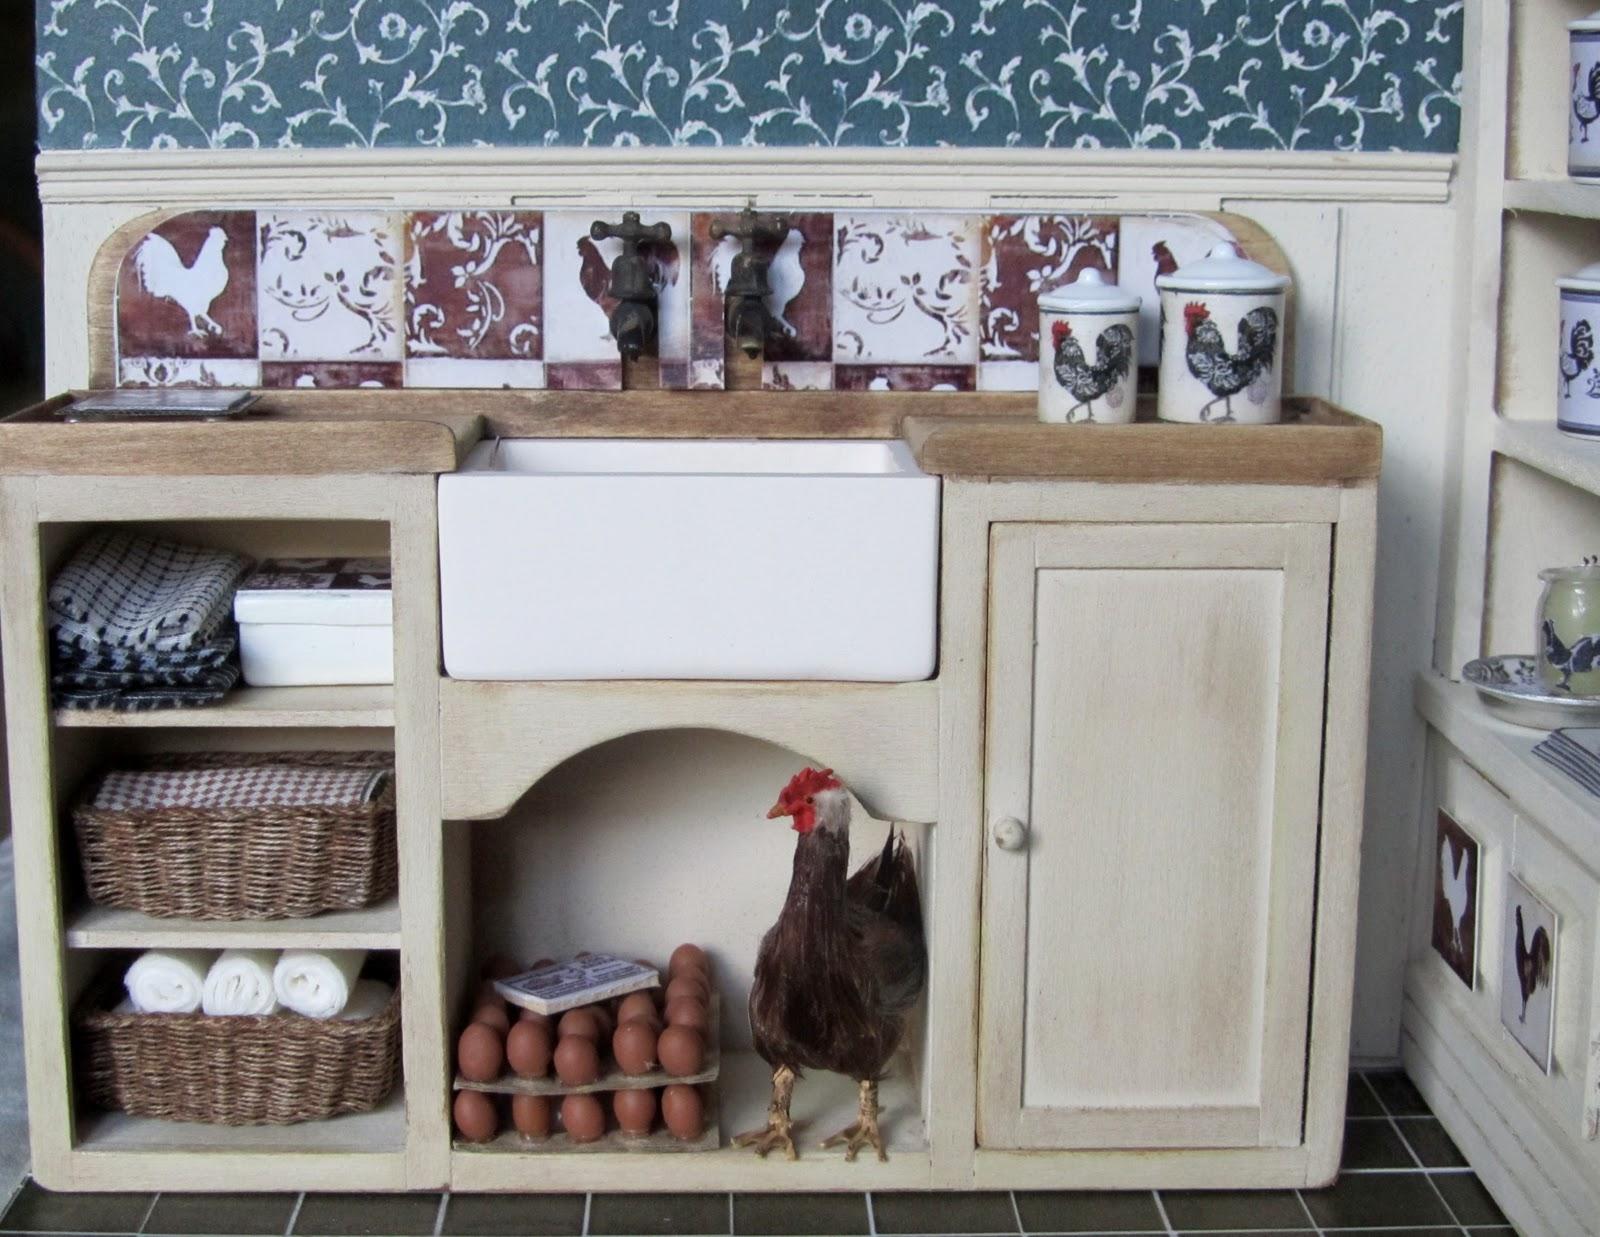 Dollhouse Kitchen Sink Fridays child the rooster roombox is finished fridays child the rooster roombox is finished workwithnaturefo